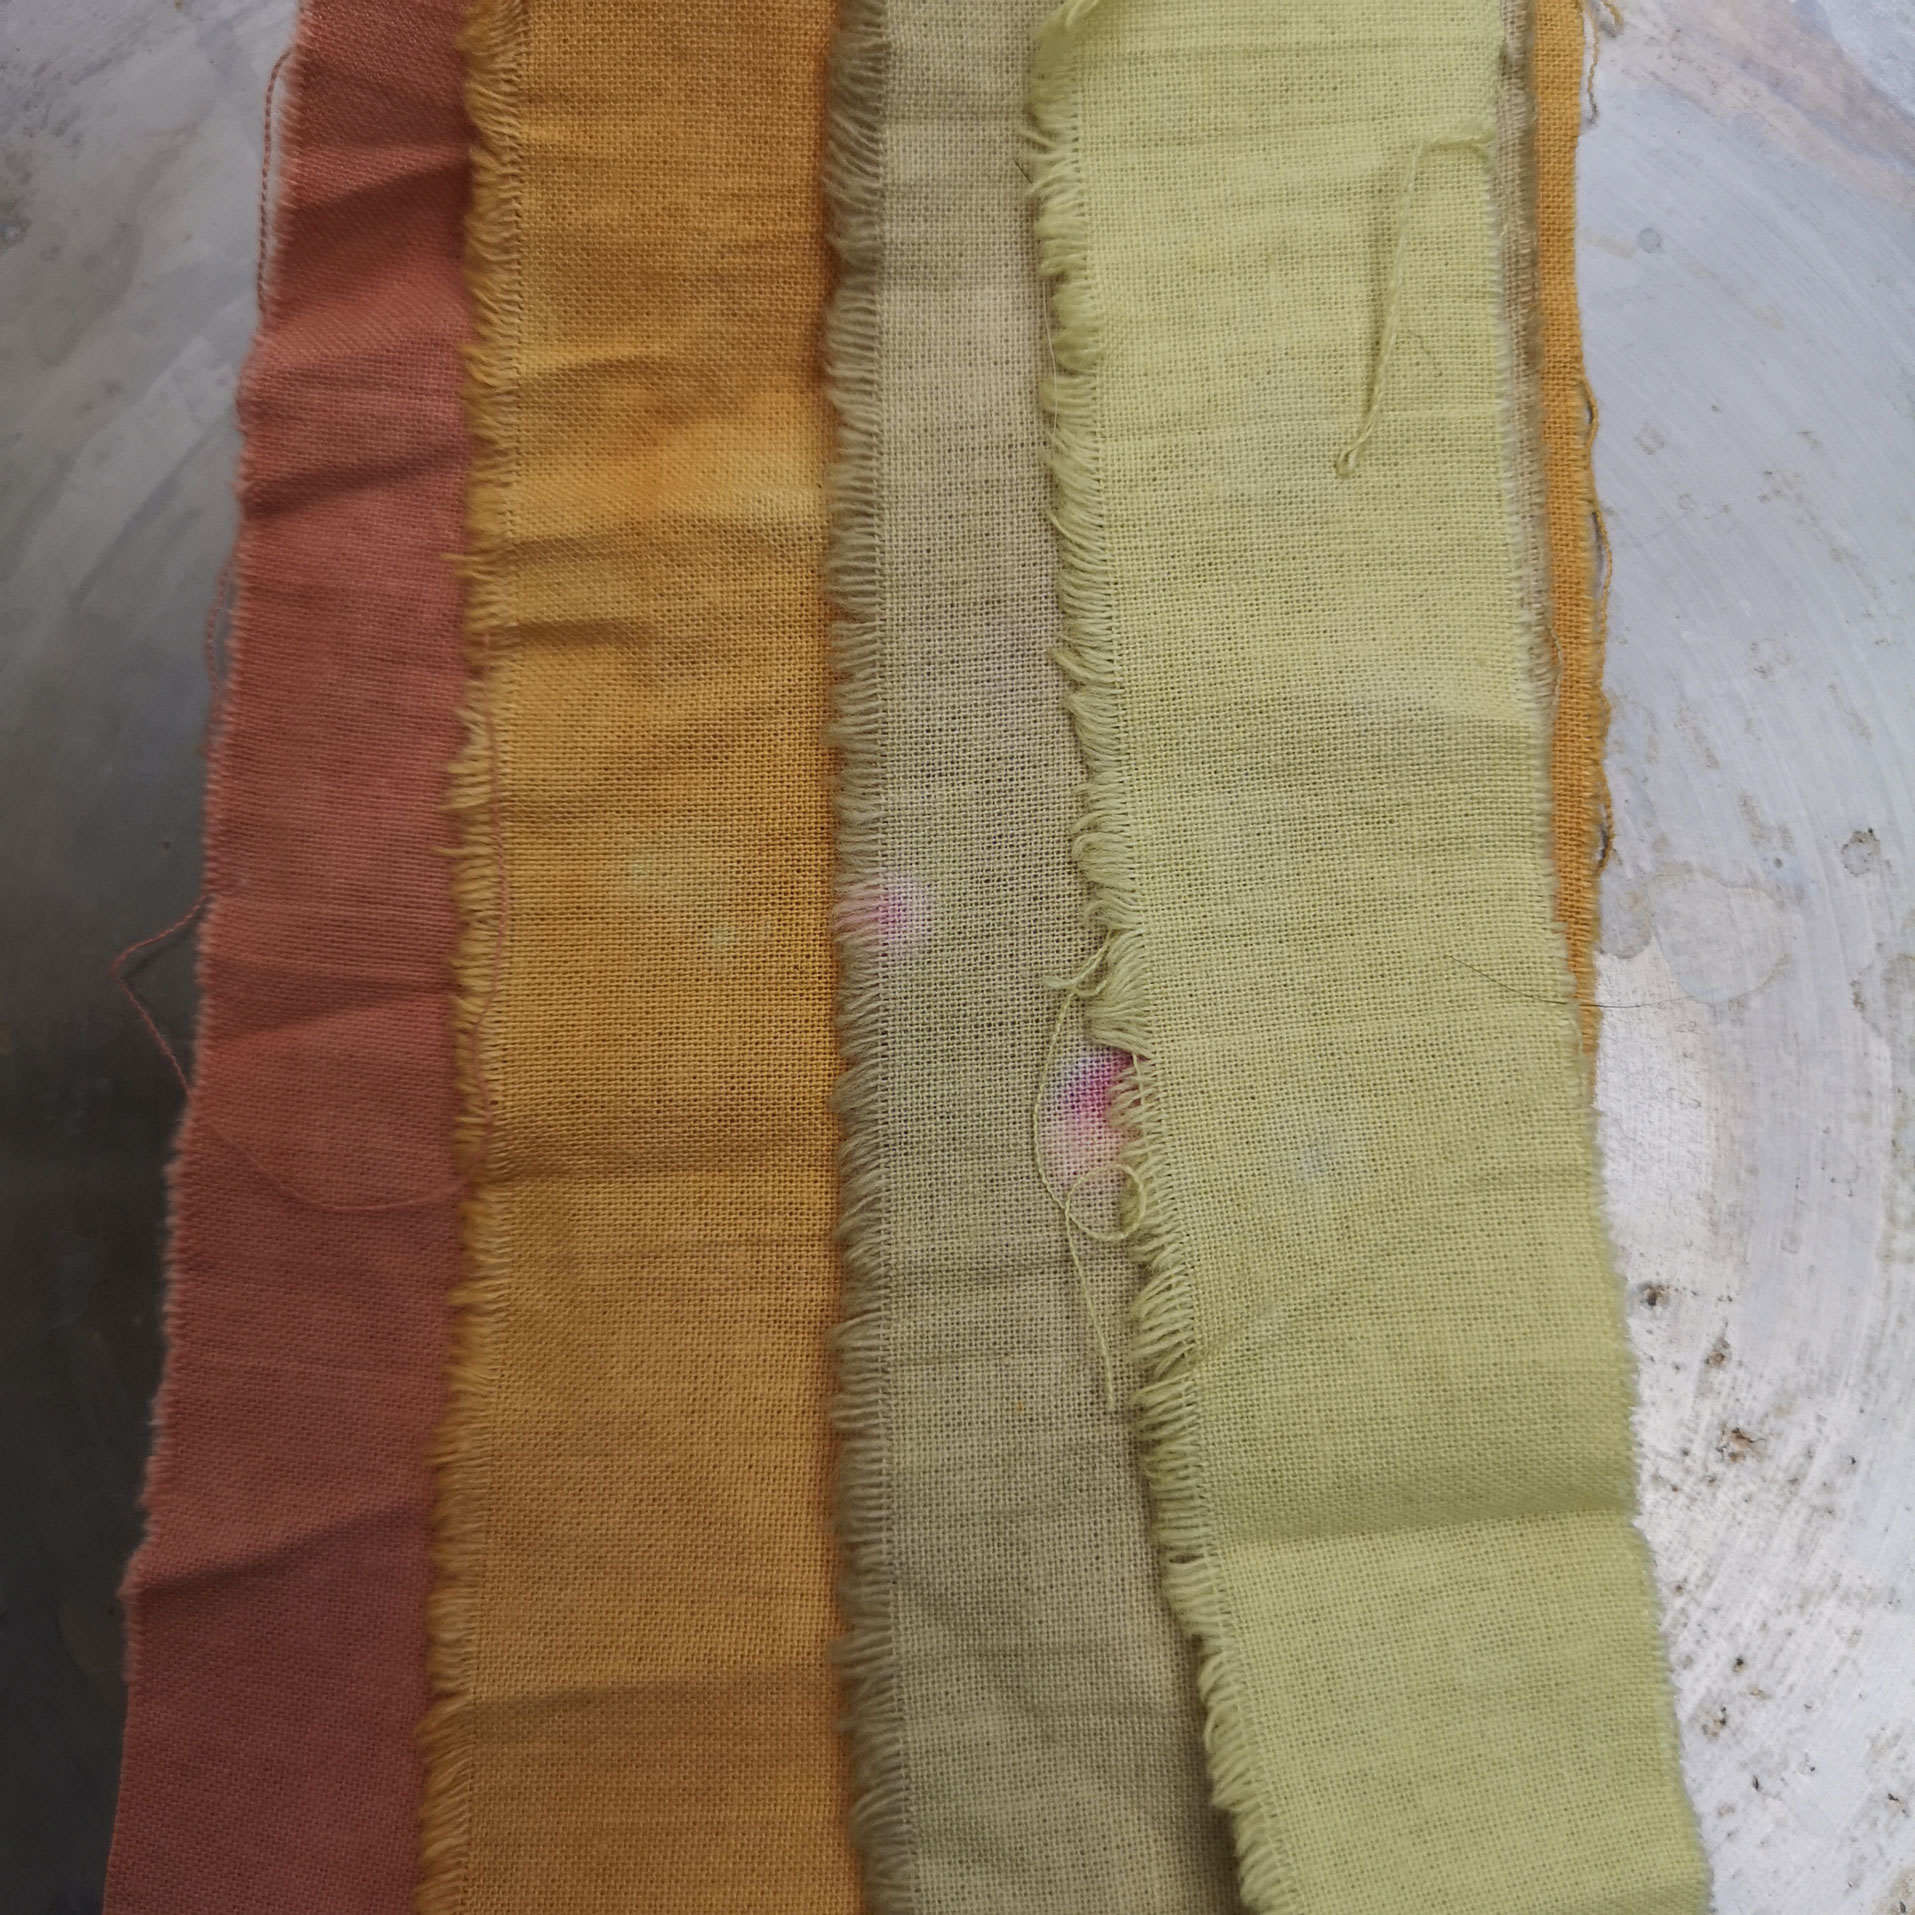 ria-burns-knitwear-natural-dye-workshop-bath-10.jpg